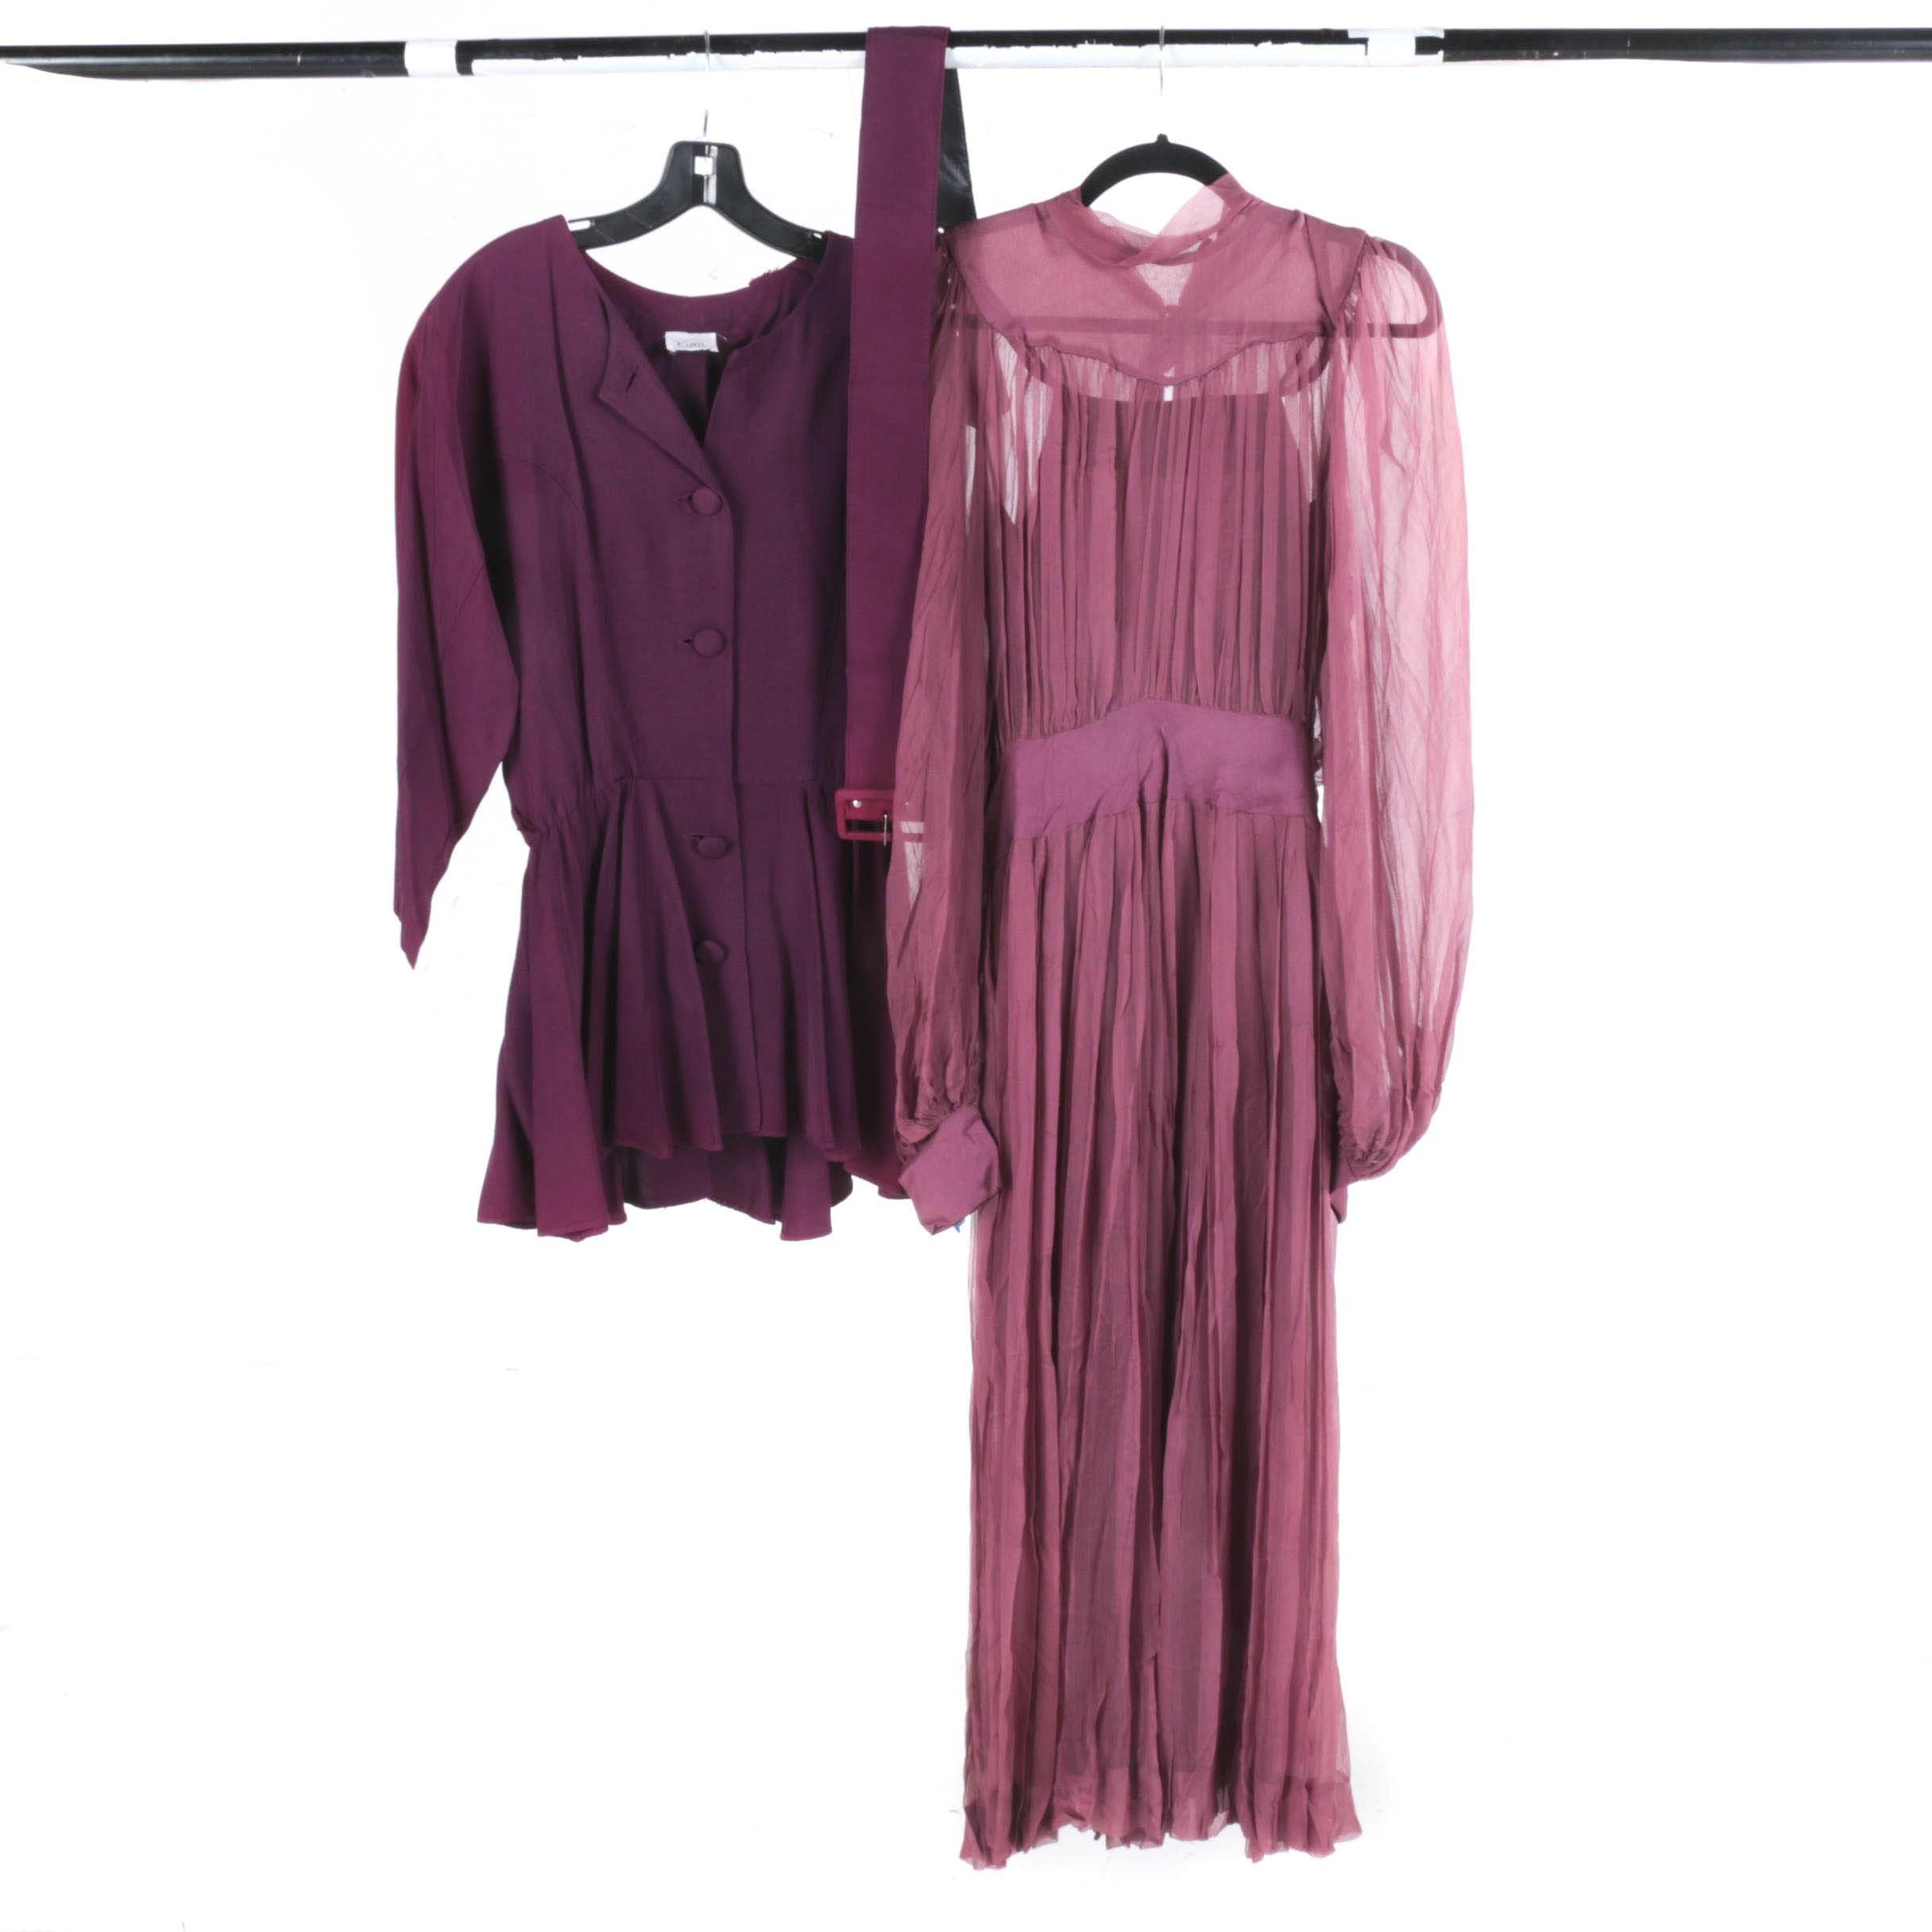 "Circa 1980""s Kwai Top With Chiffon Dress"